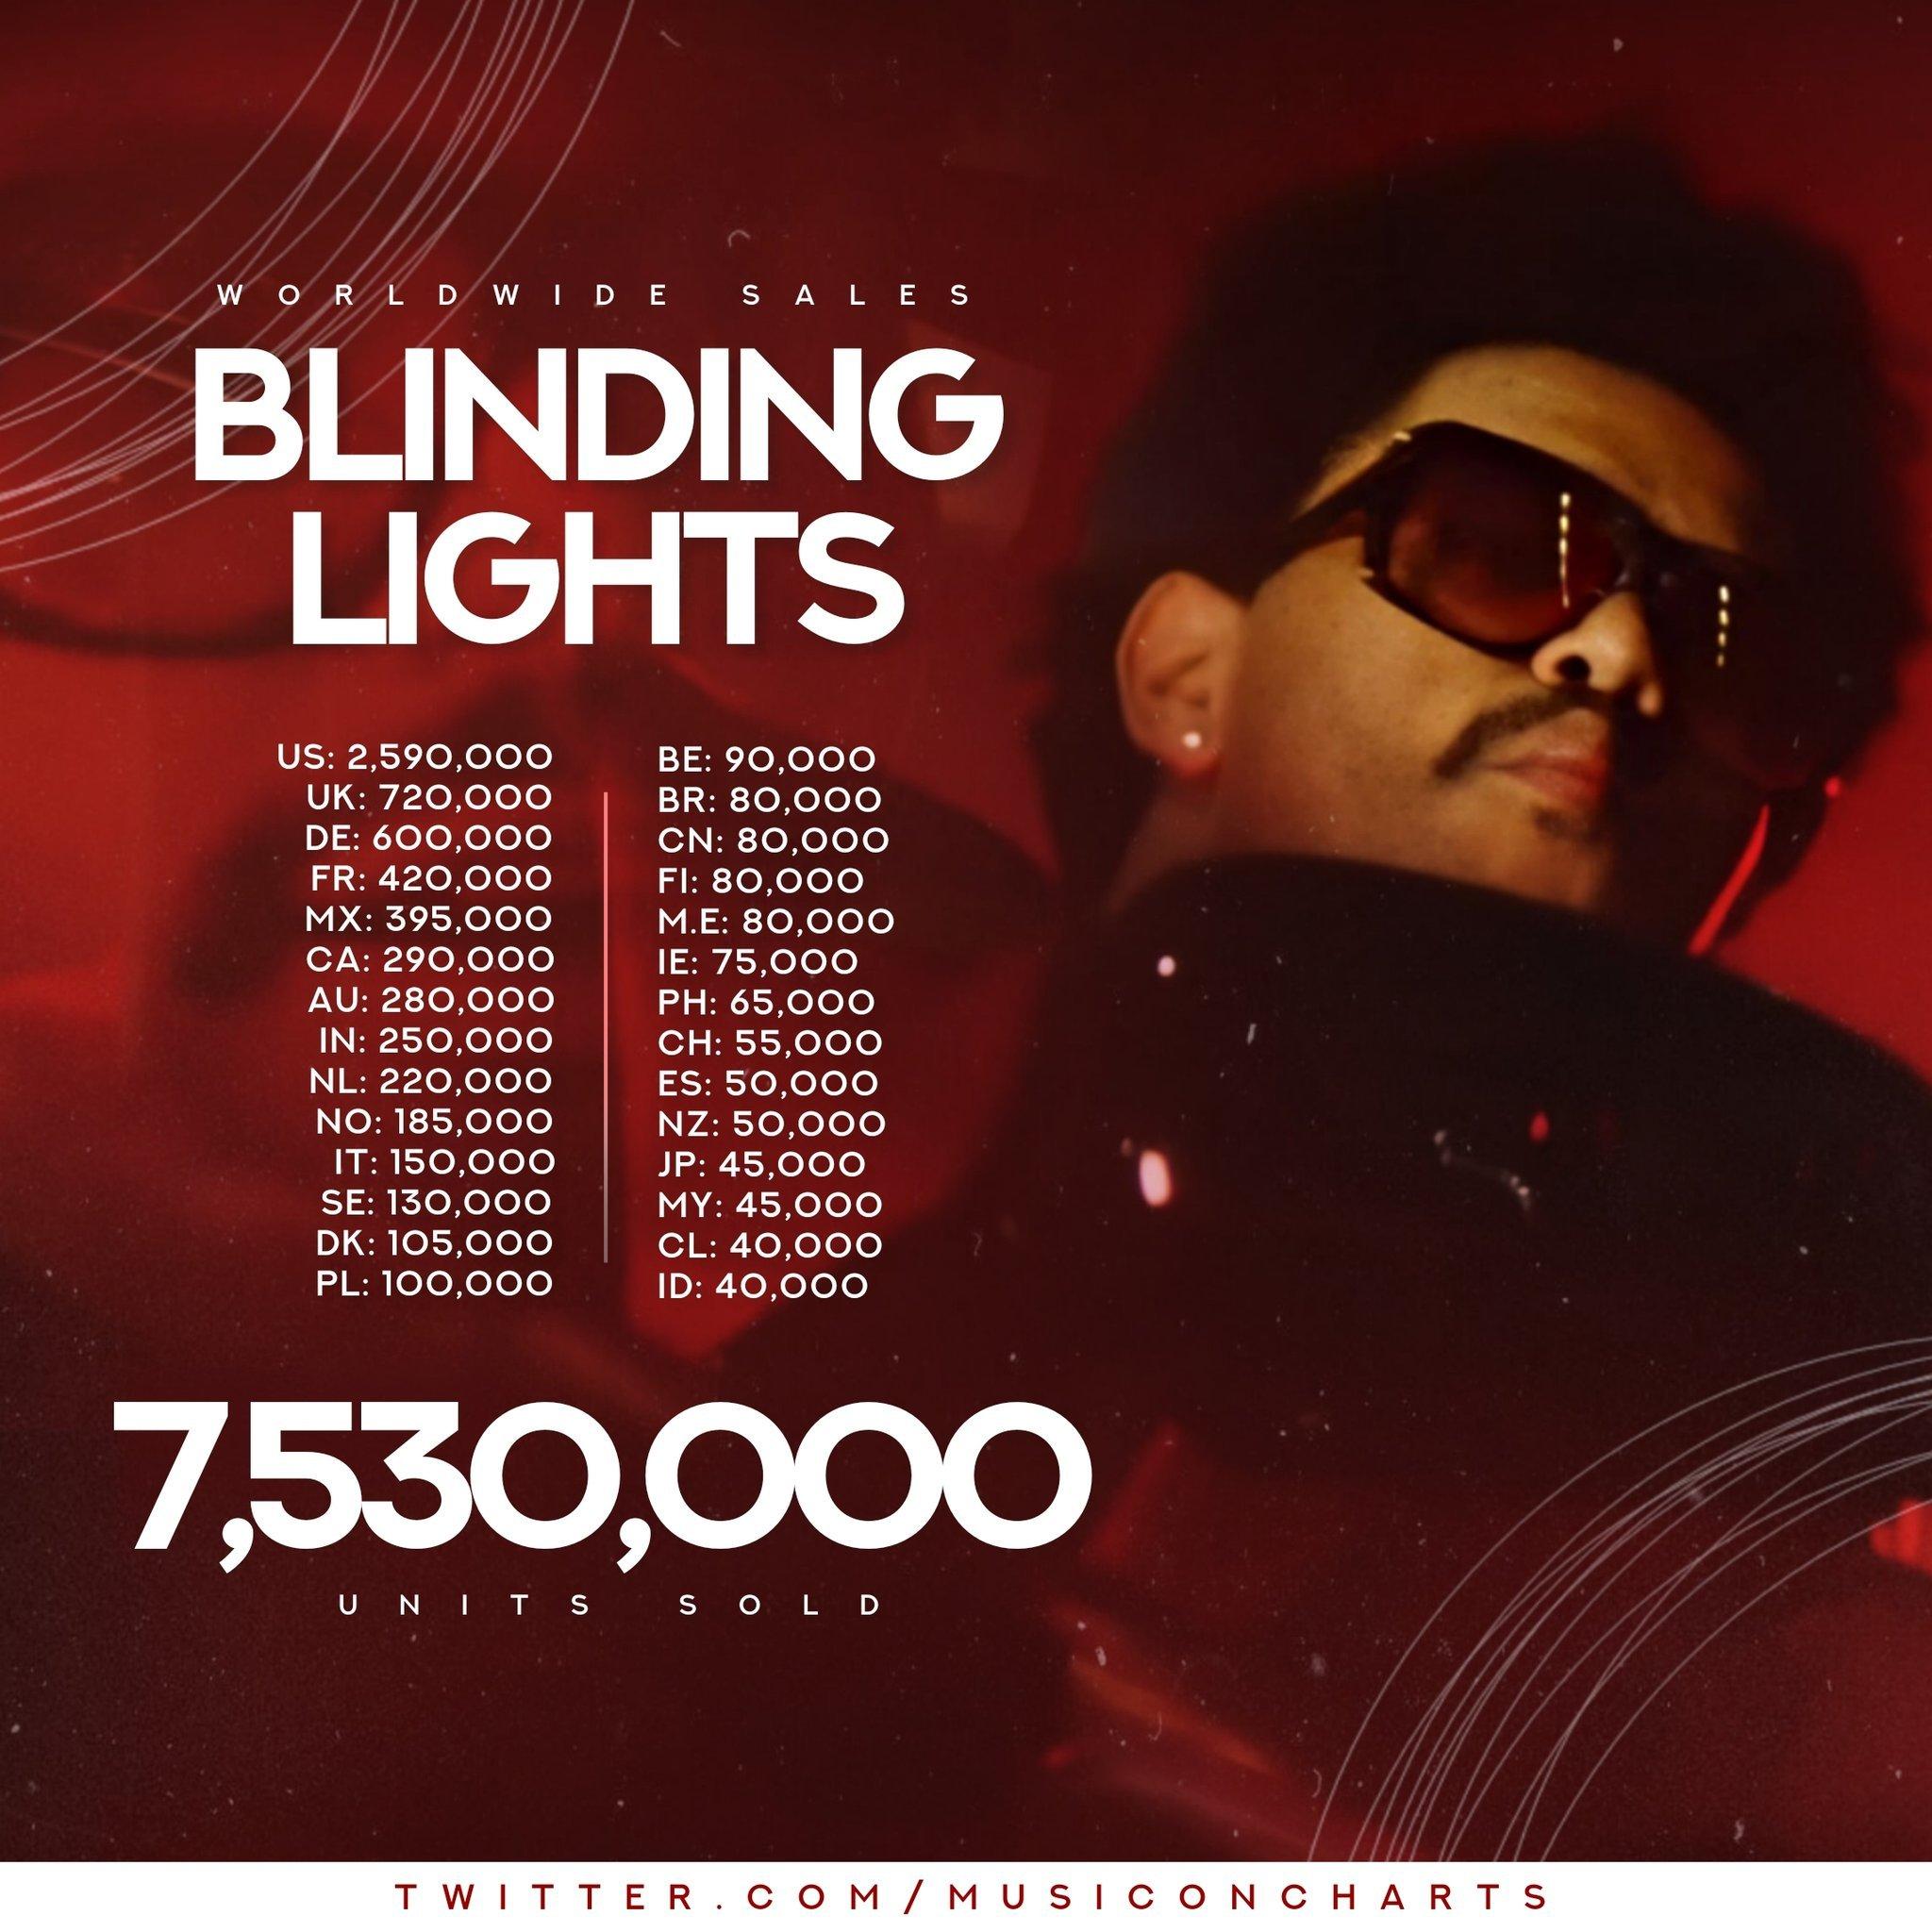 blinding lights worldwide sales